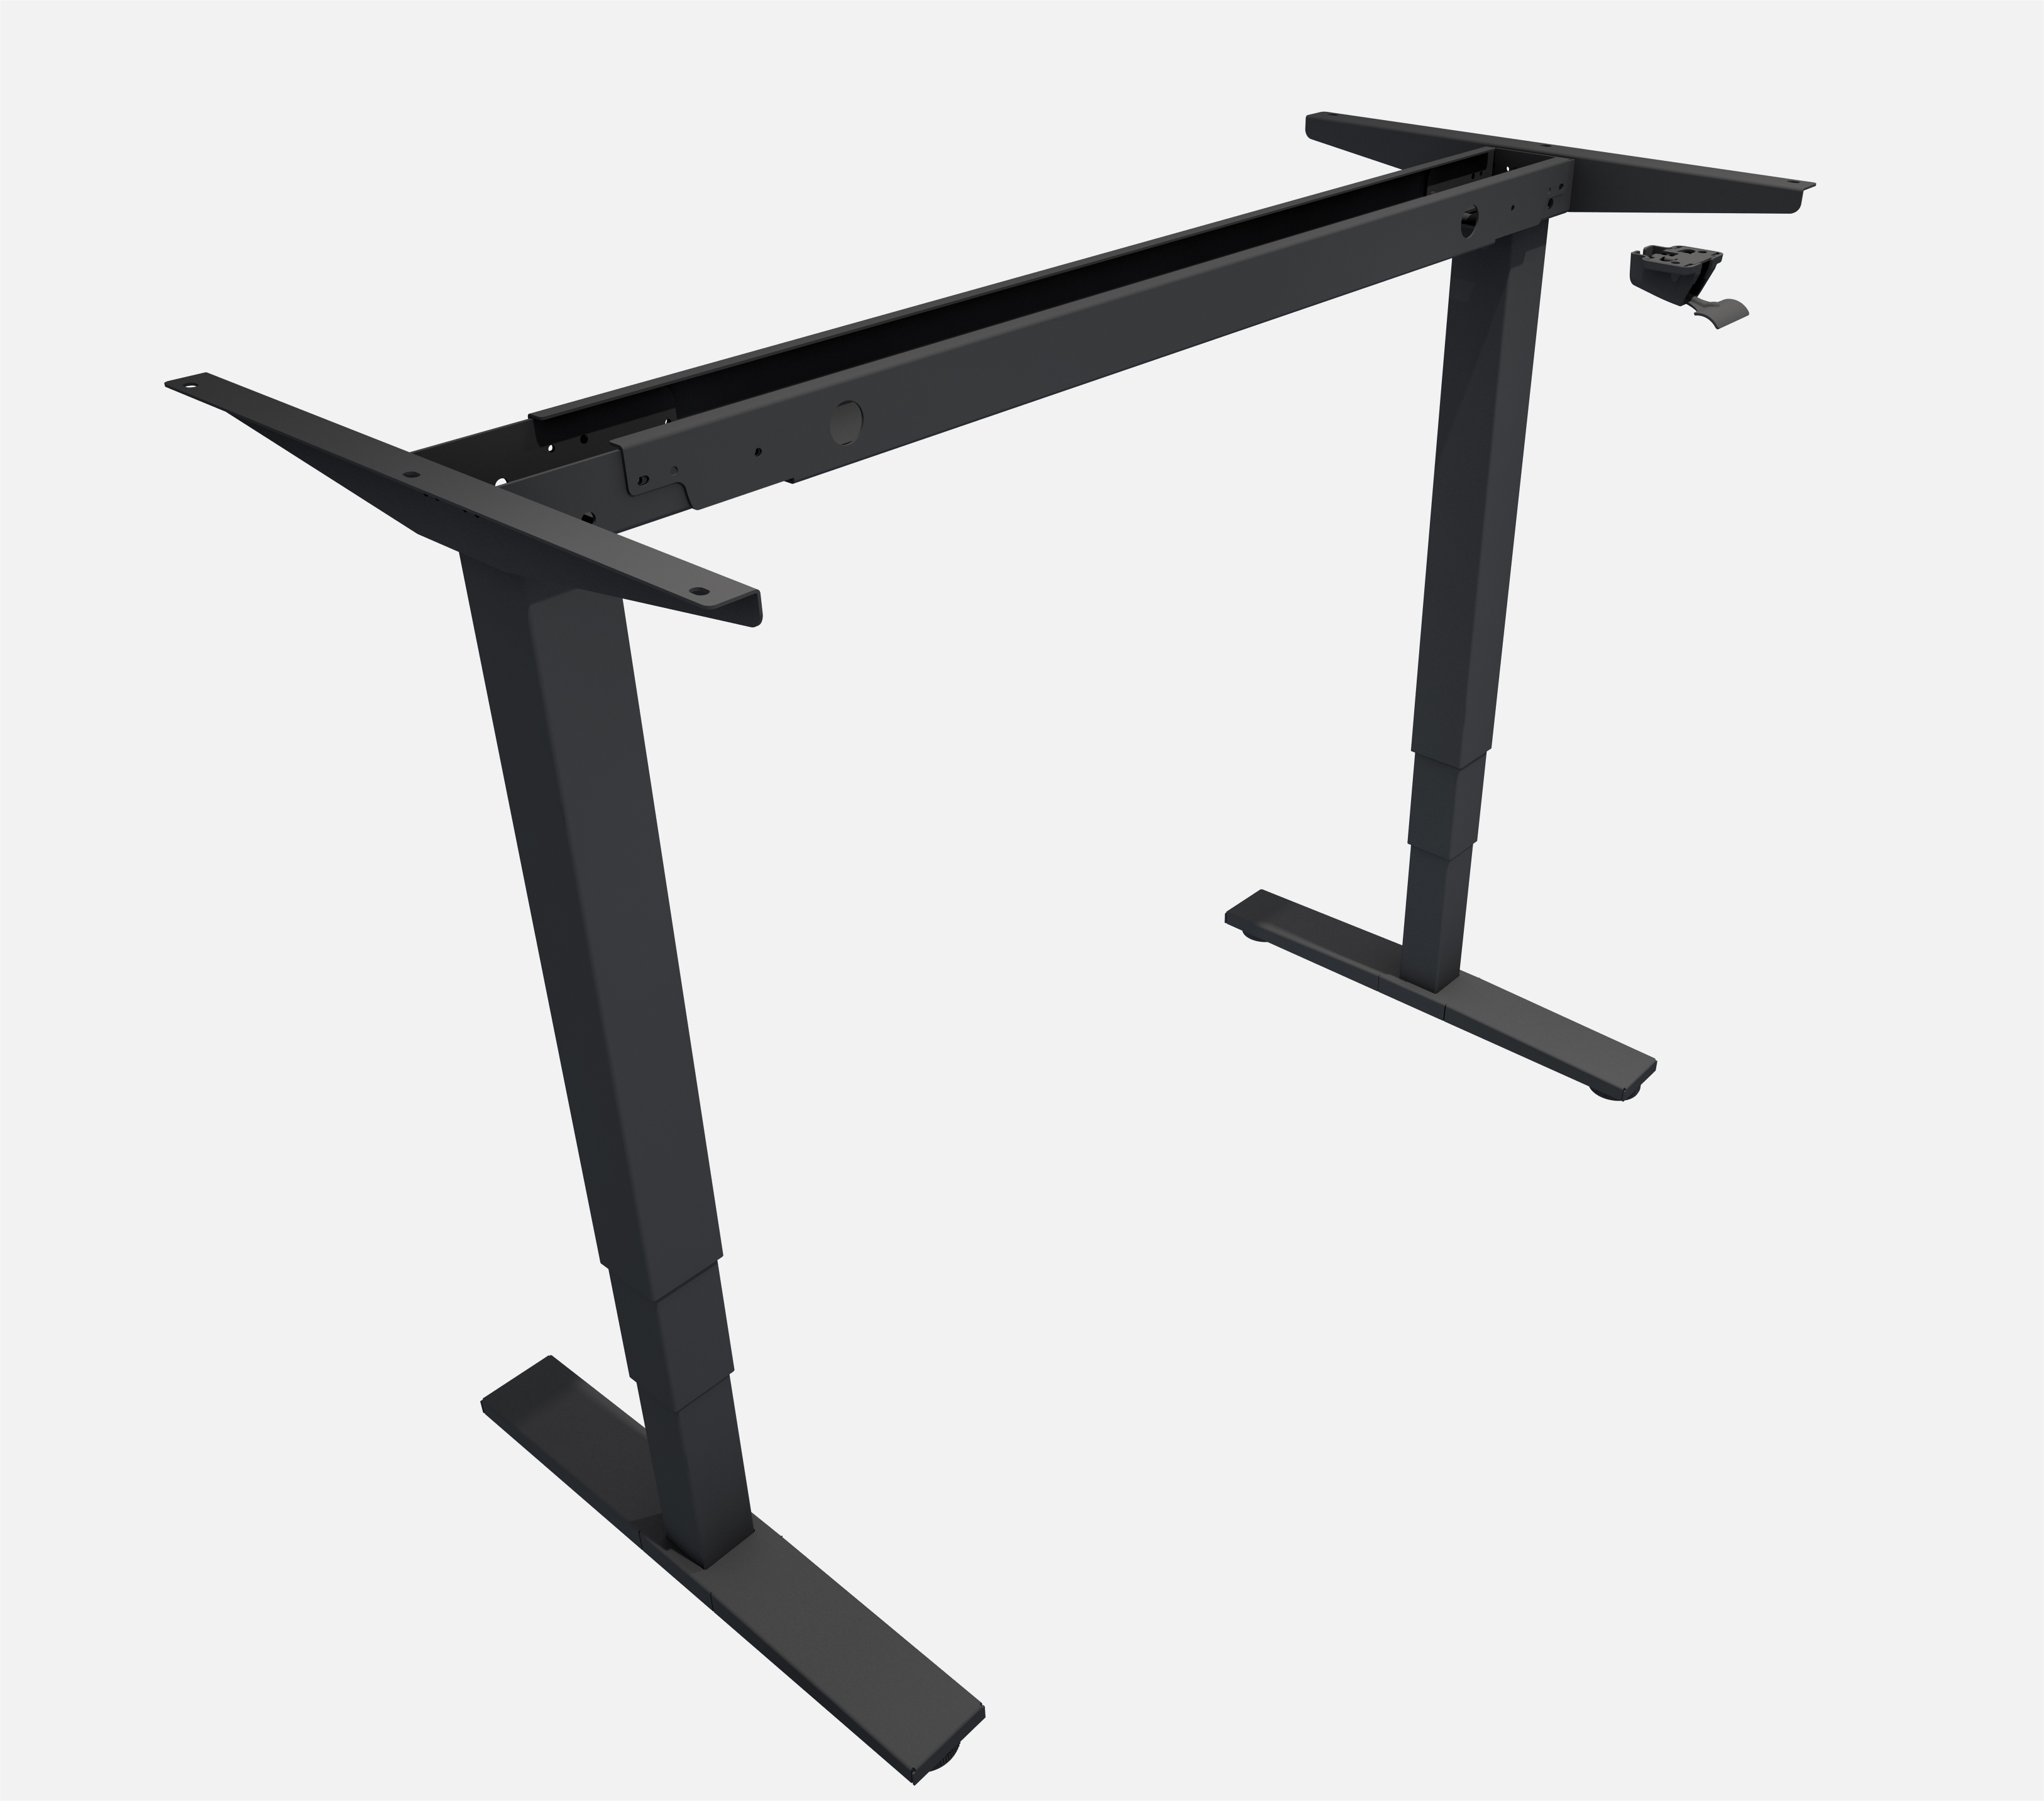 Allcam GDF12B gas spring sit stand desk height adjustable